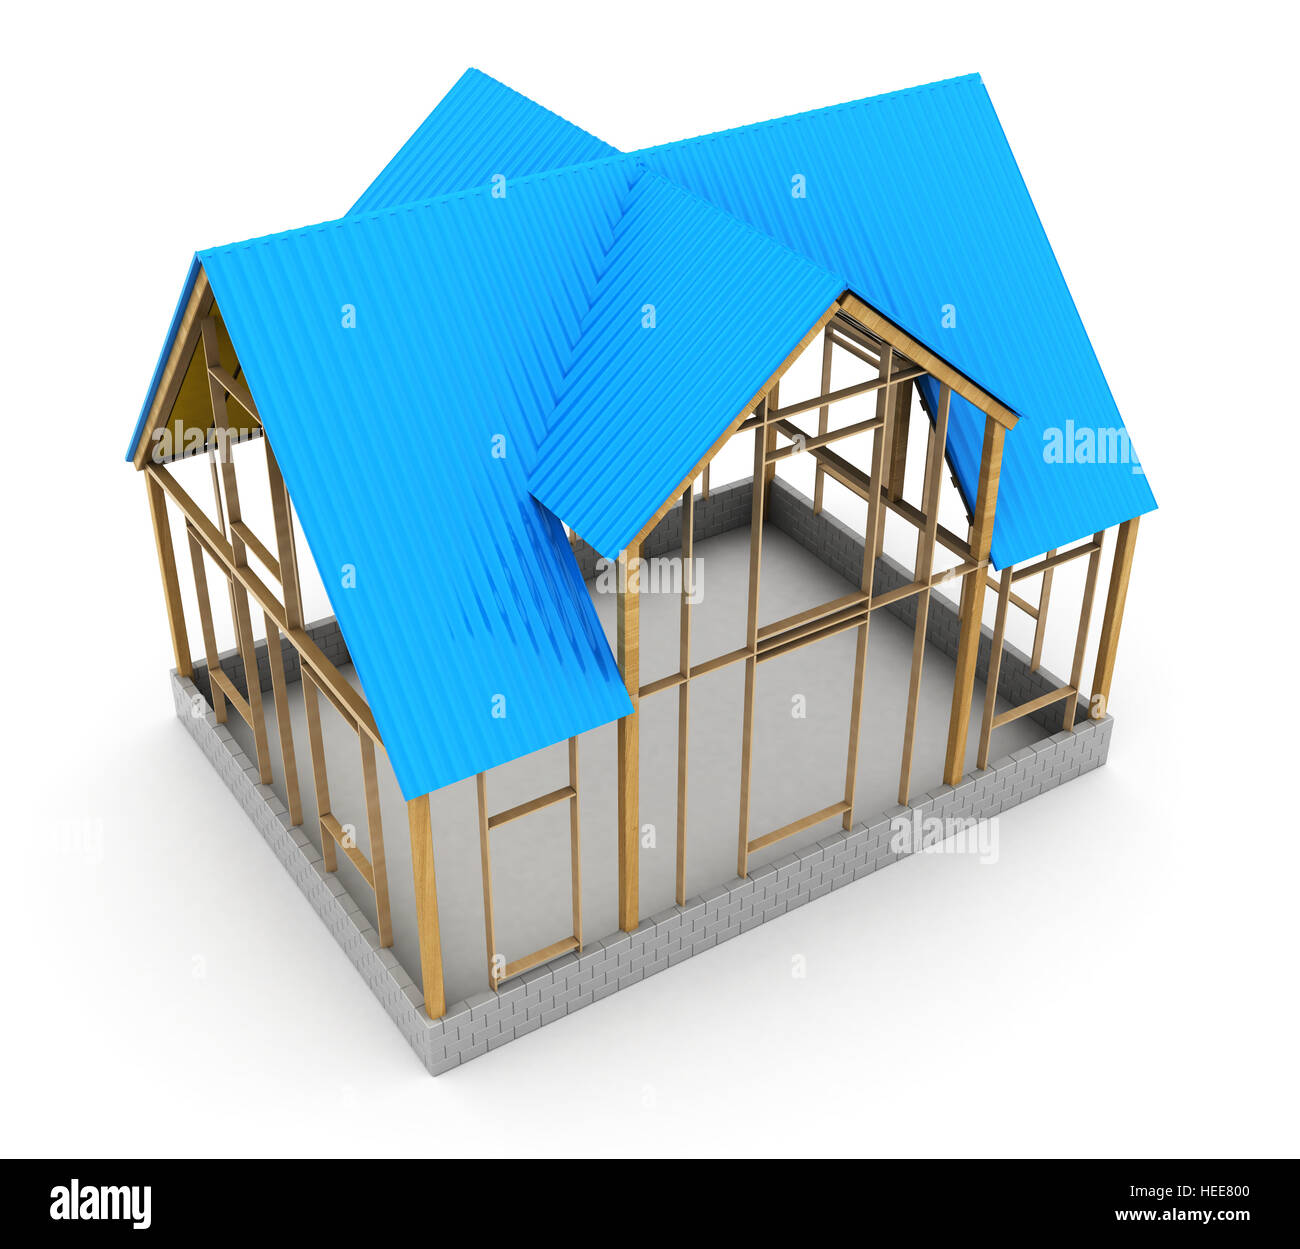 3d illustration of frame house construction blue metal roof stock 3d illustration of frame house construction blue metal roof ccuart Gallery